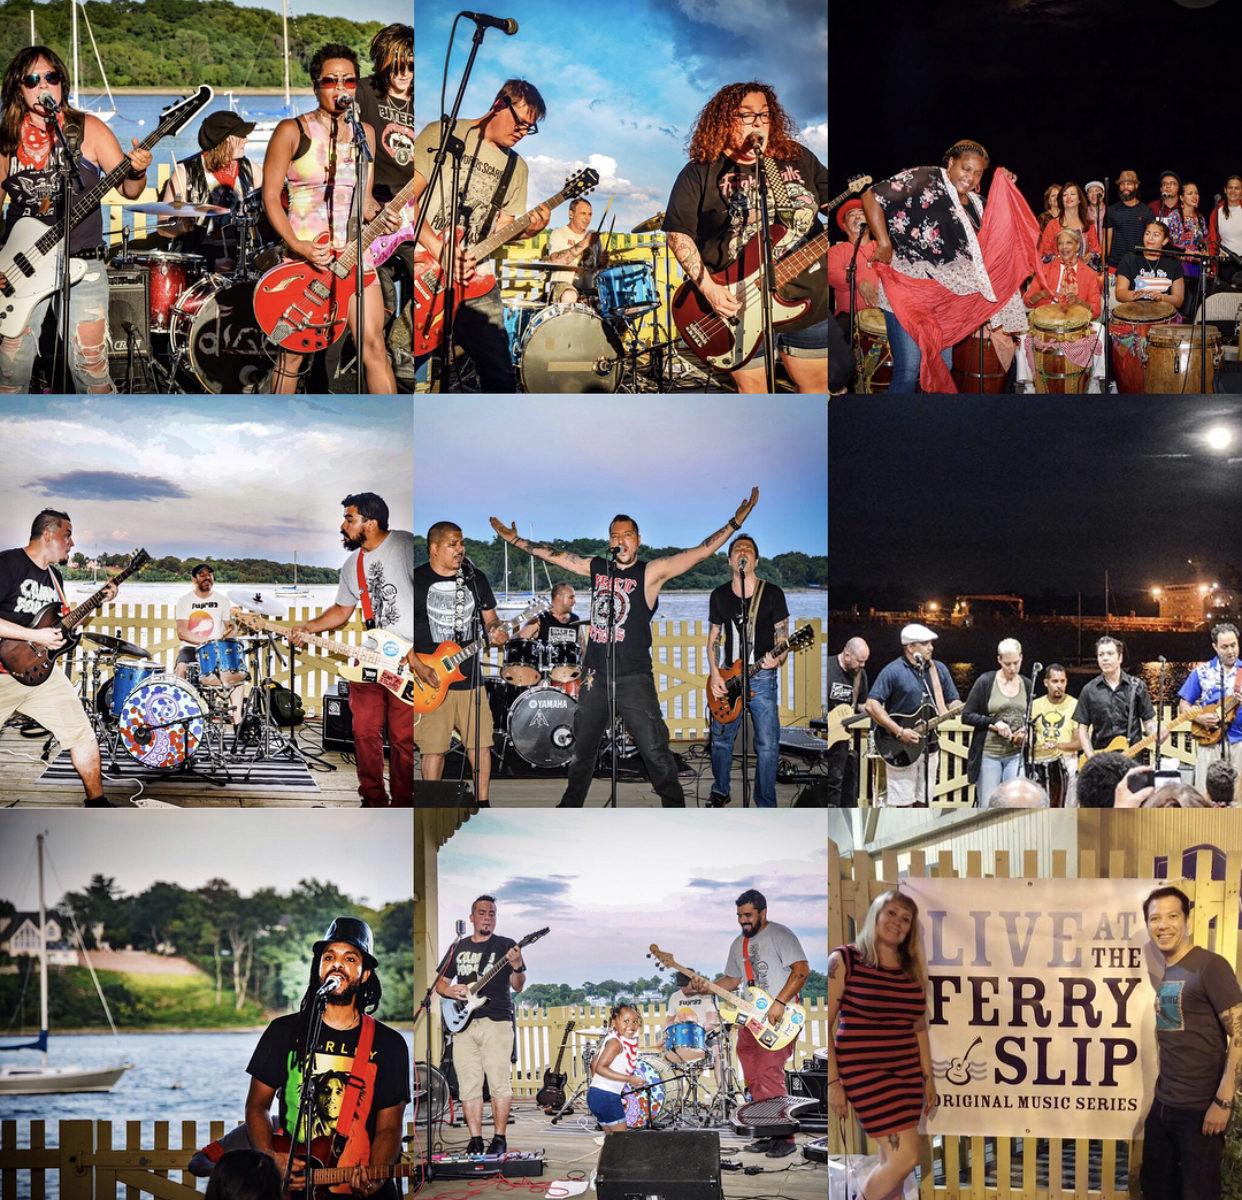 Perth Amboy Artworks Live at the Ferry Slip Music Series Raritan Bay Perth Amboy NJ